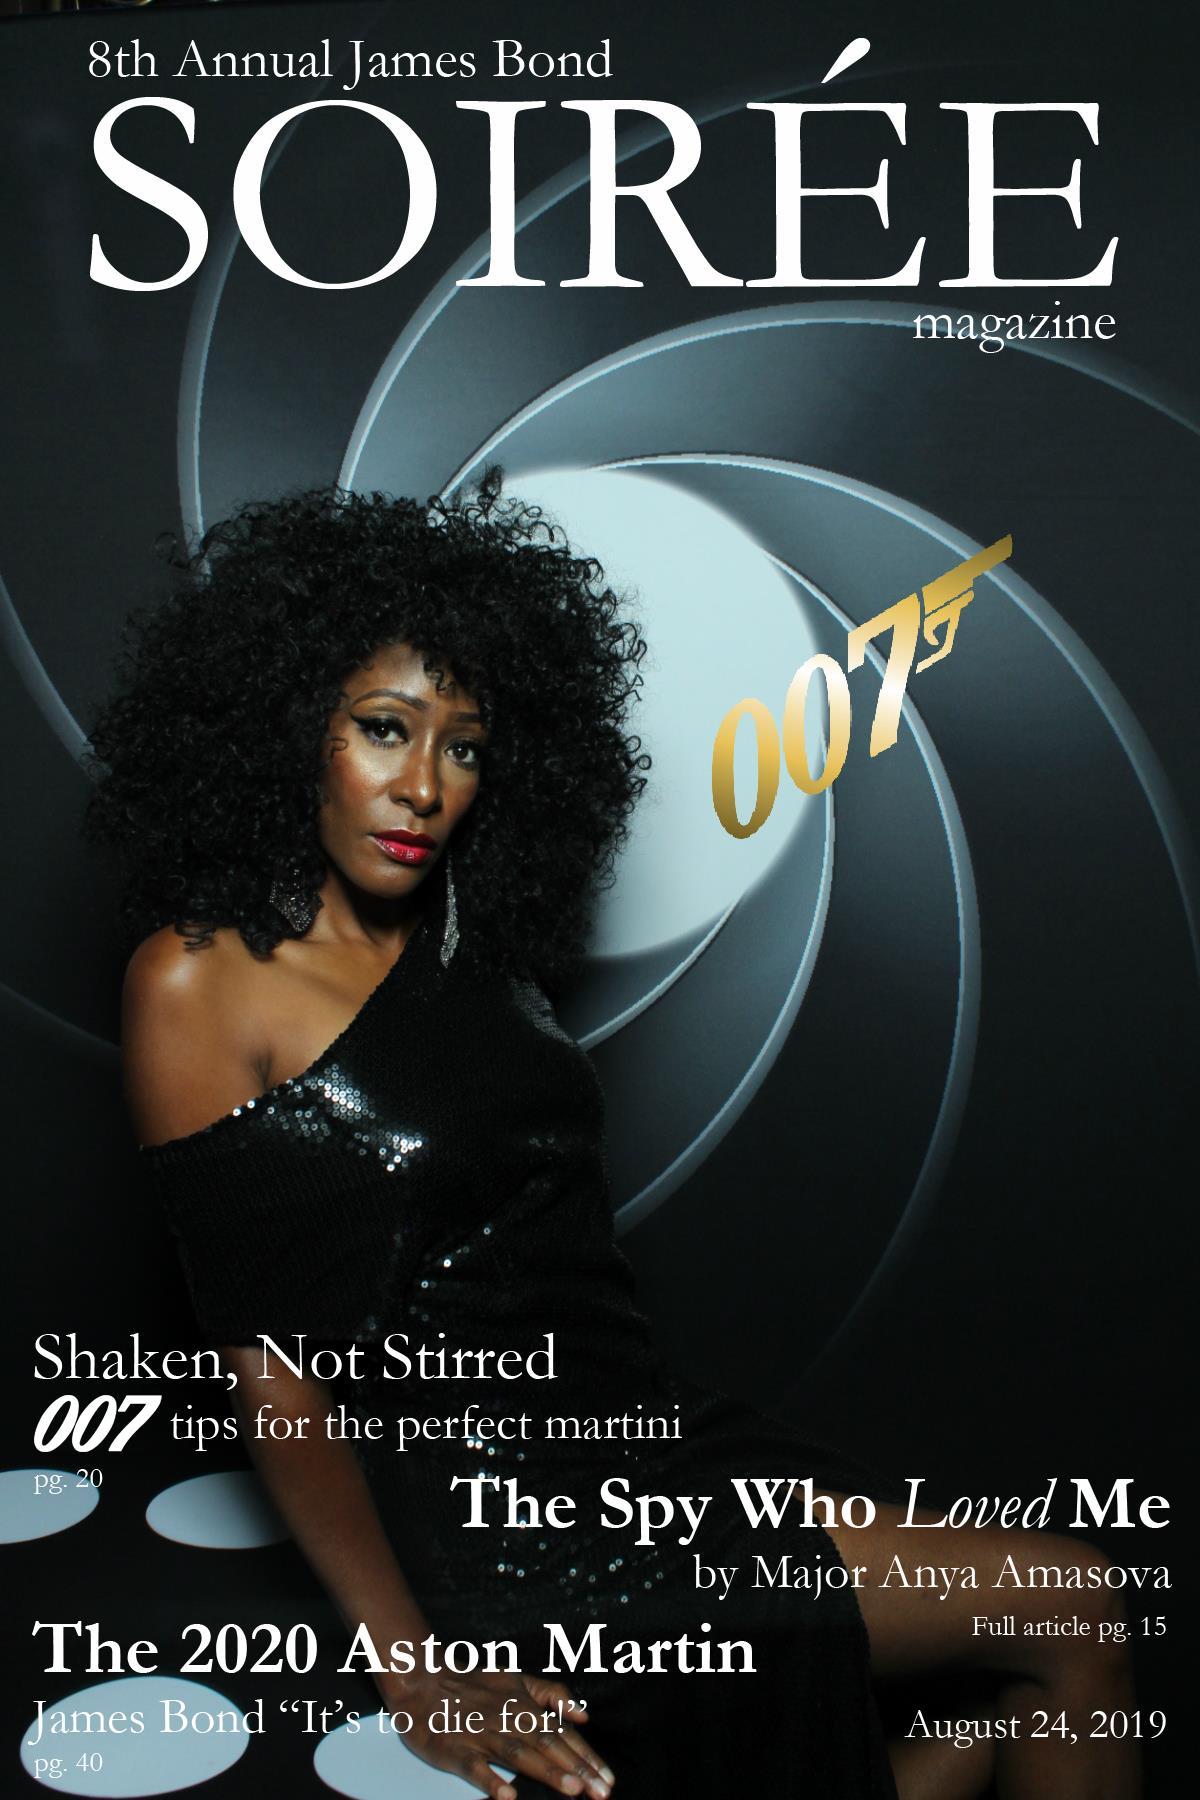 ames Bond Soiree, James Bond Decor, Soiree James Bond, James Bond Theme Pittsburgh, James Bond Theme Casino Night, Magazine Cover